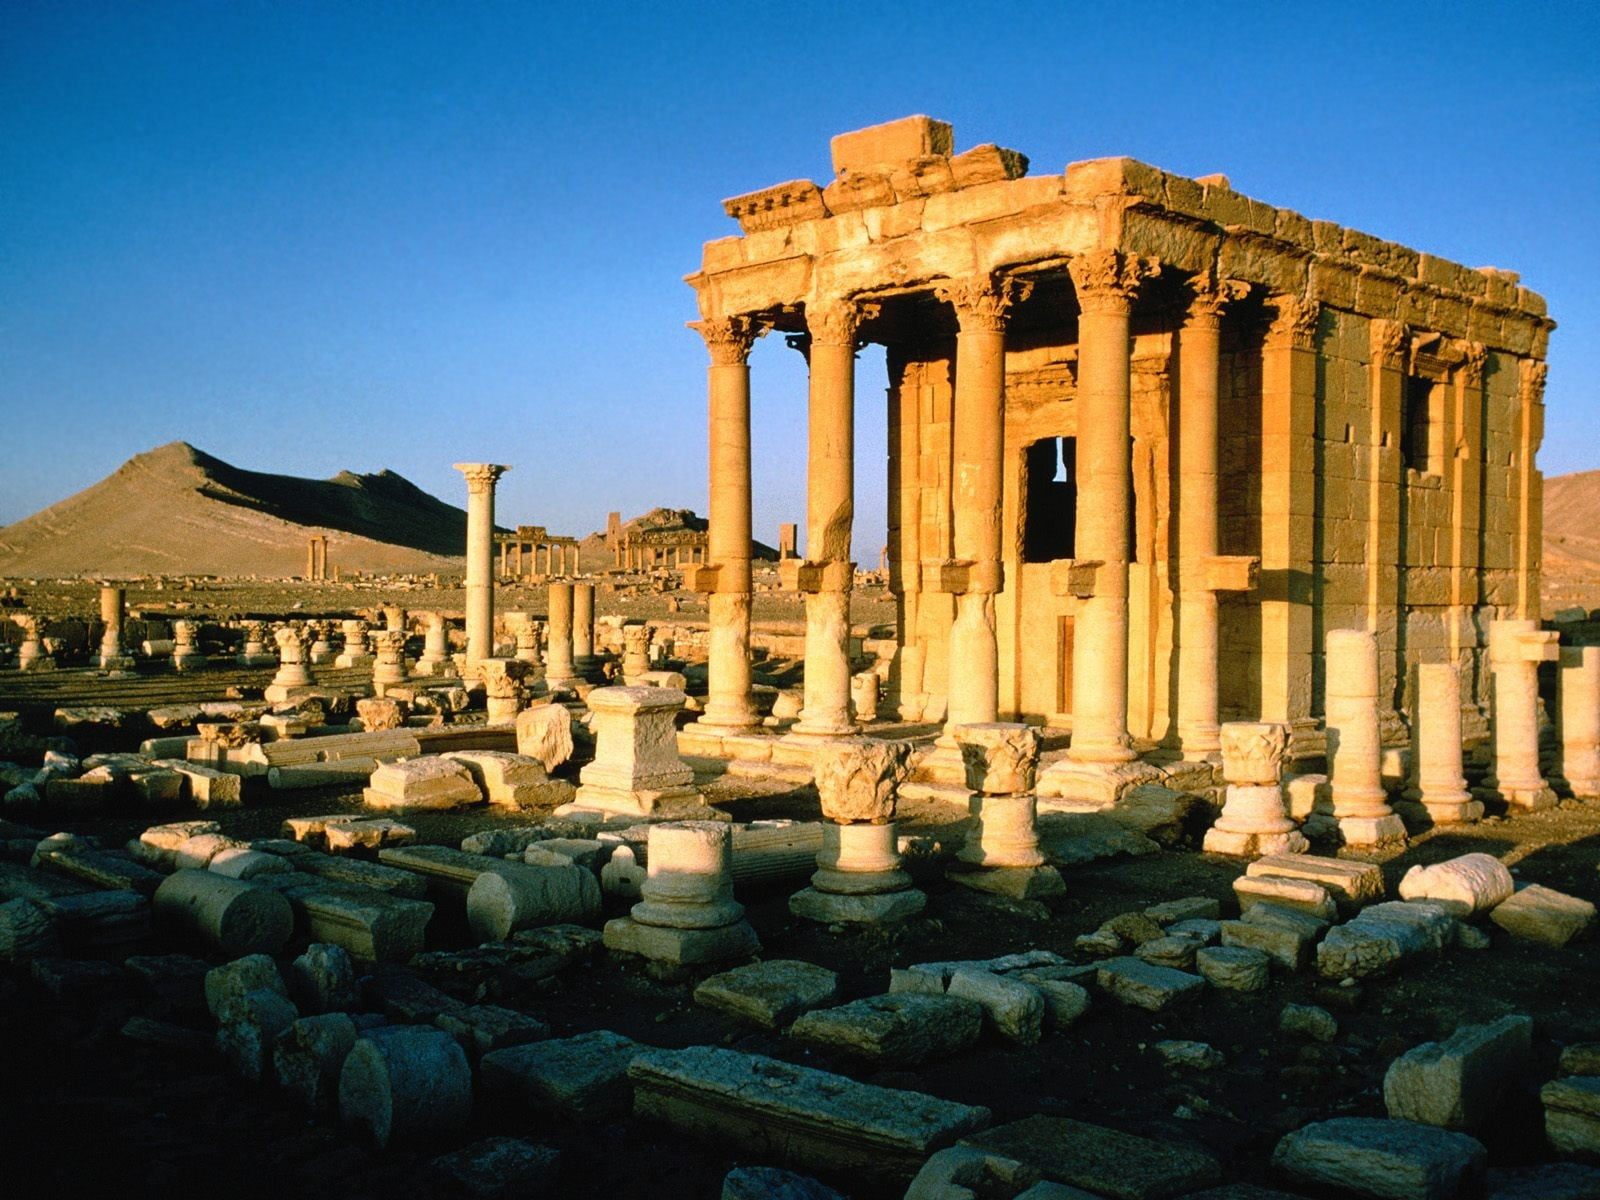 Parthenon Athens Greece ruins Syria HD wallpaper Wallpaper Flare 1600x1200